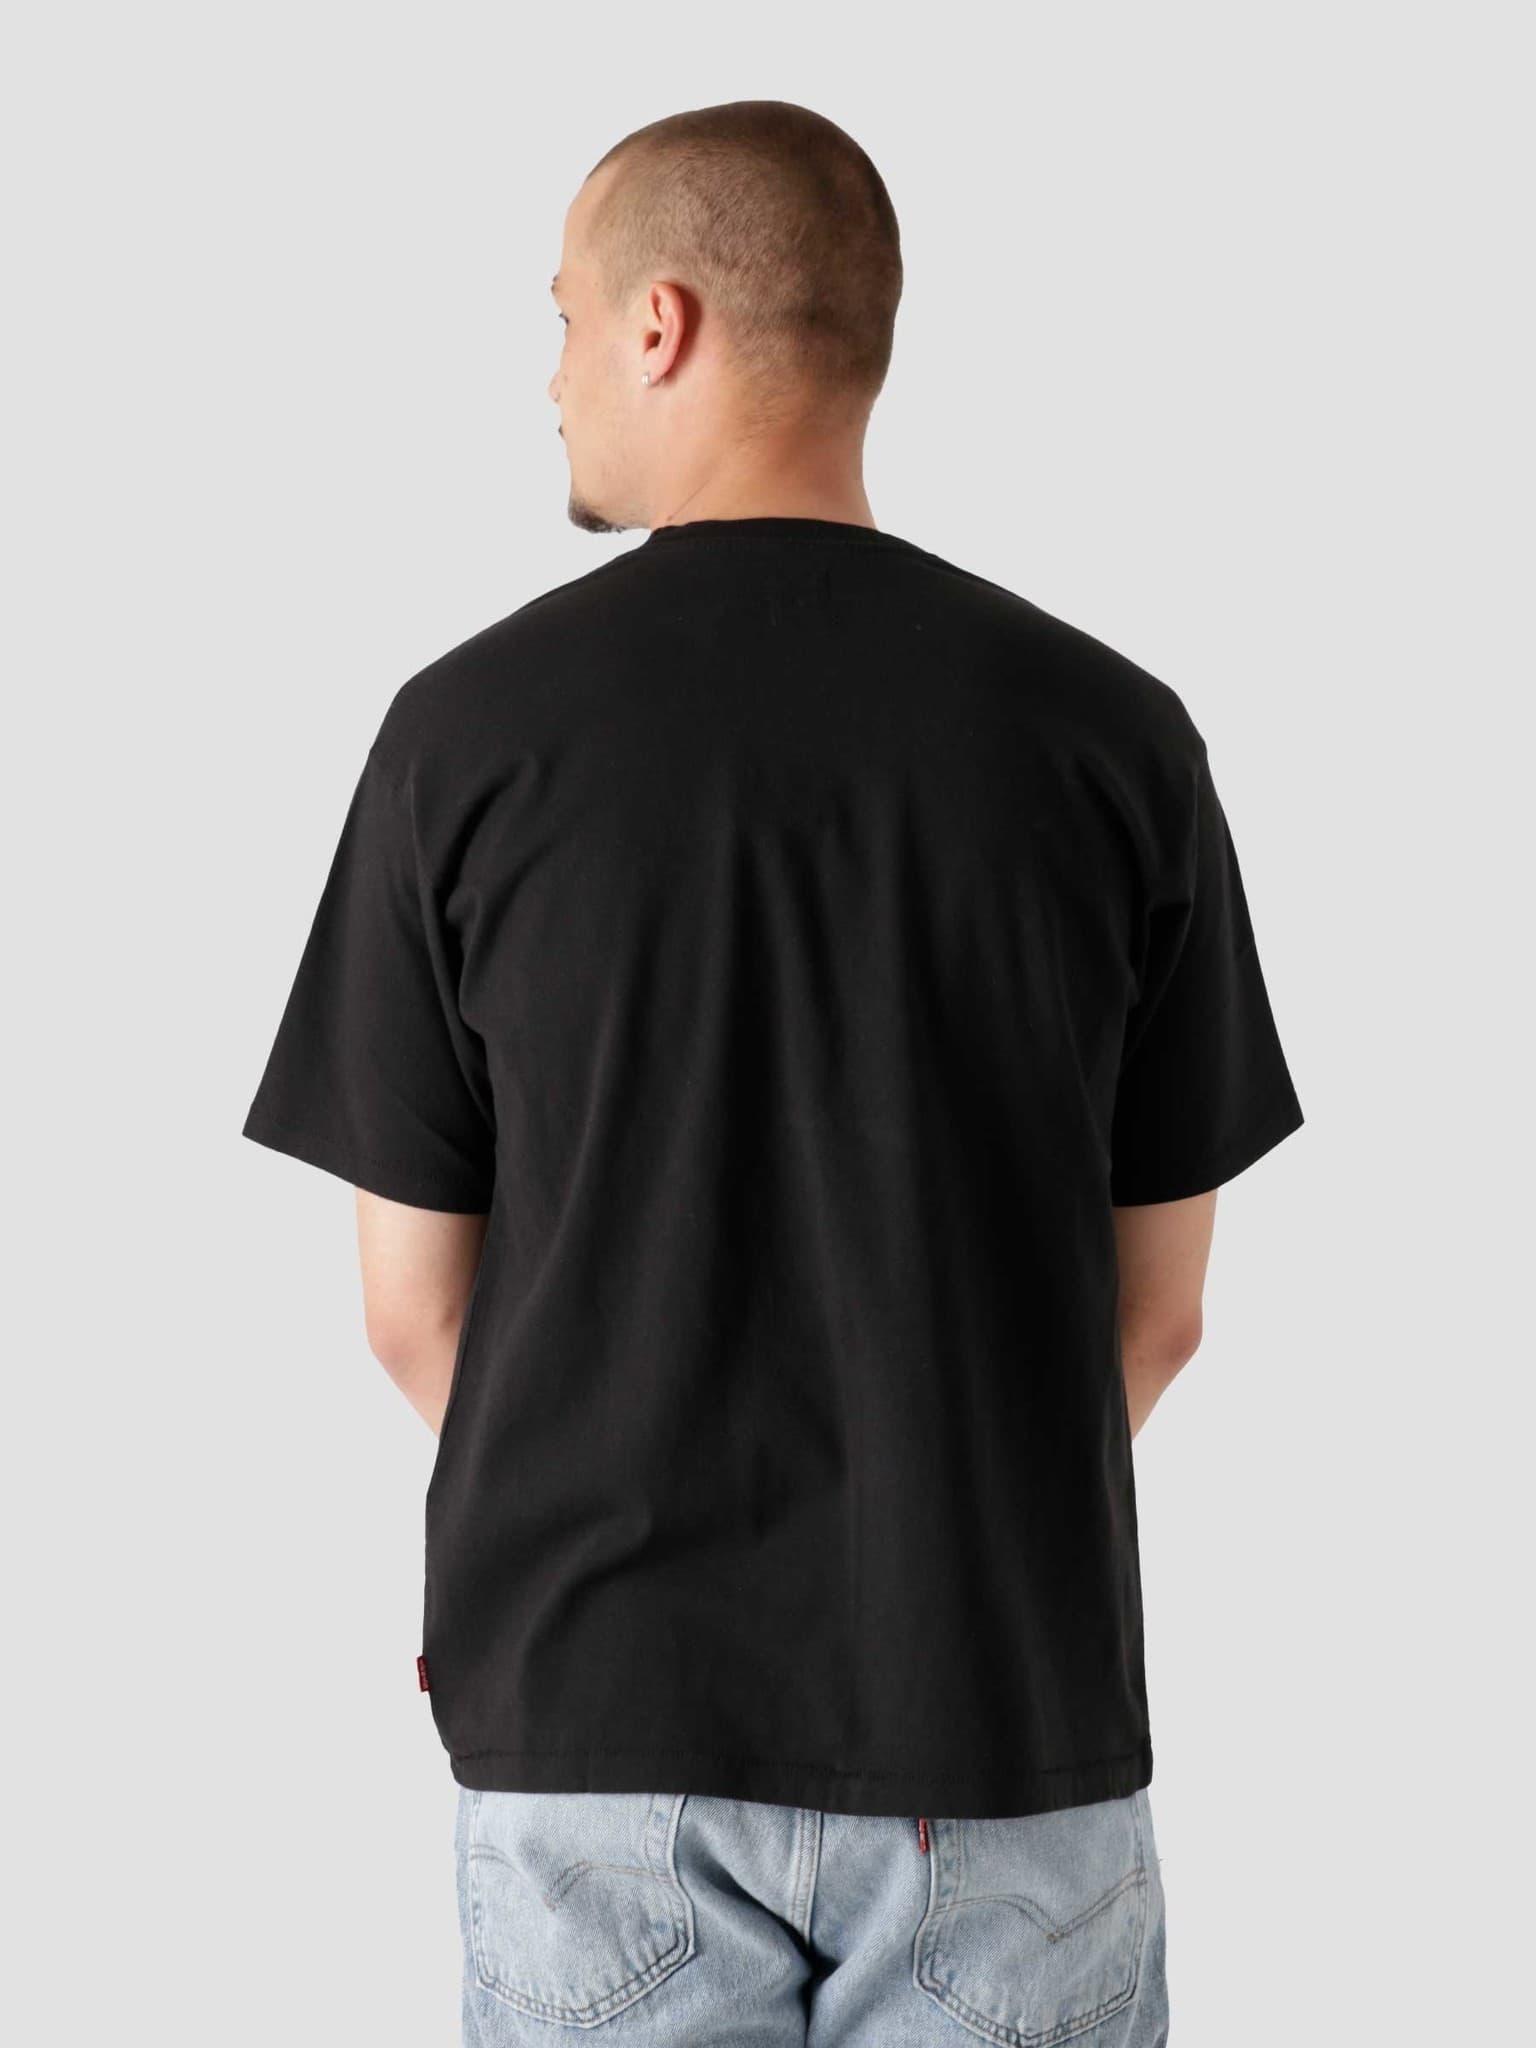 Red Tab Vintage T-Shirt Mineral Bl Blacks A0637-0001